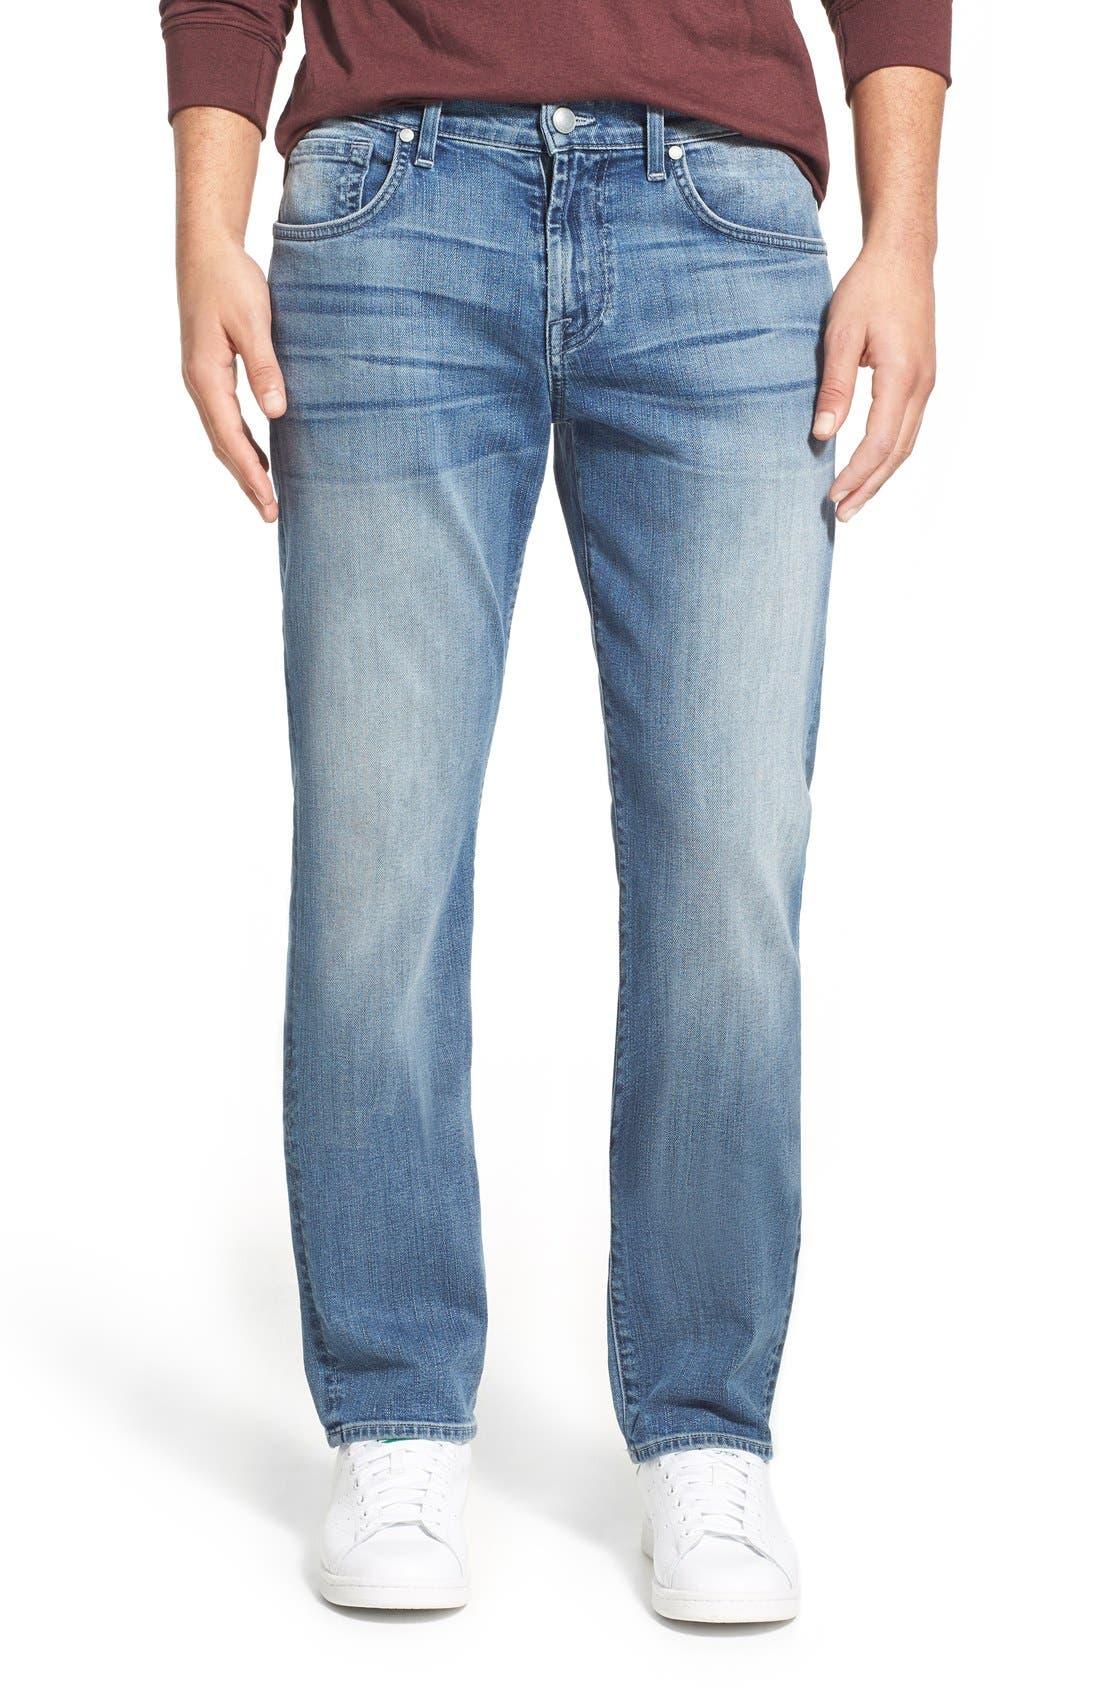 'Straight - FoolProof' Slim Straight Leg Jeans,                             Main thumbnail 1, color,                             402